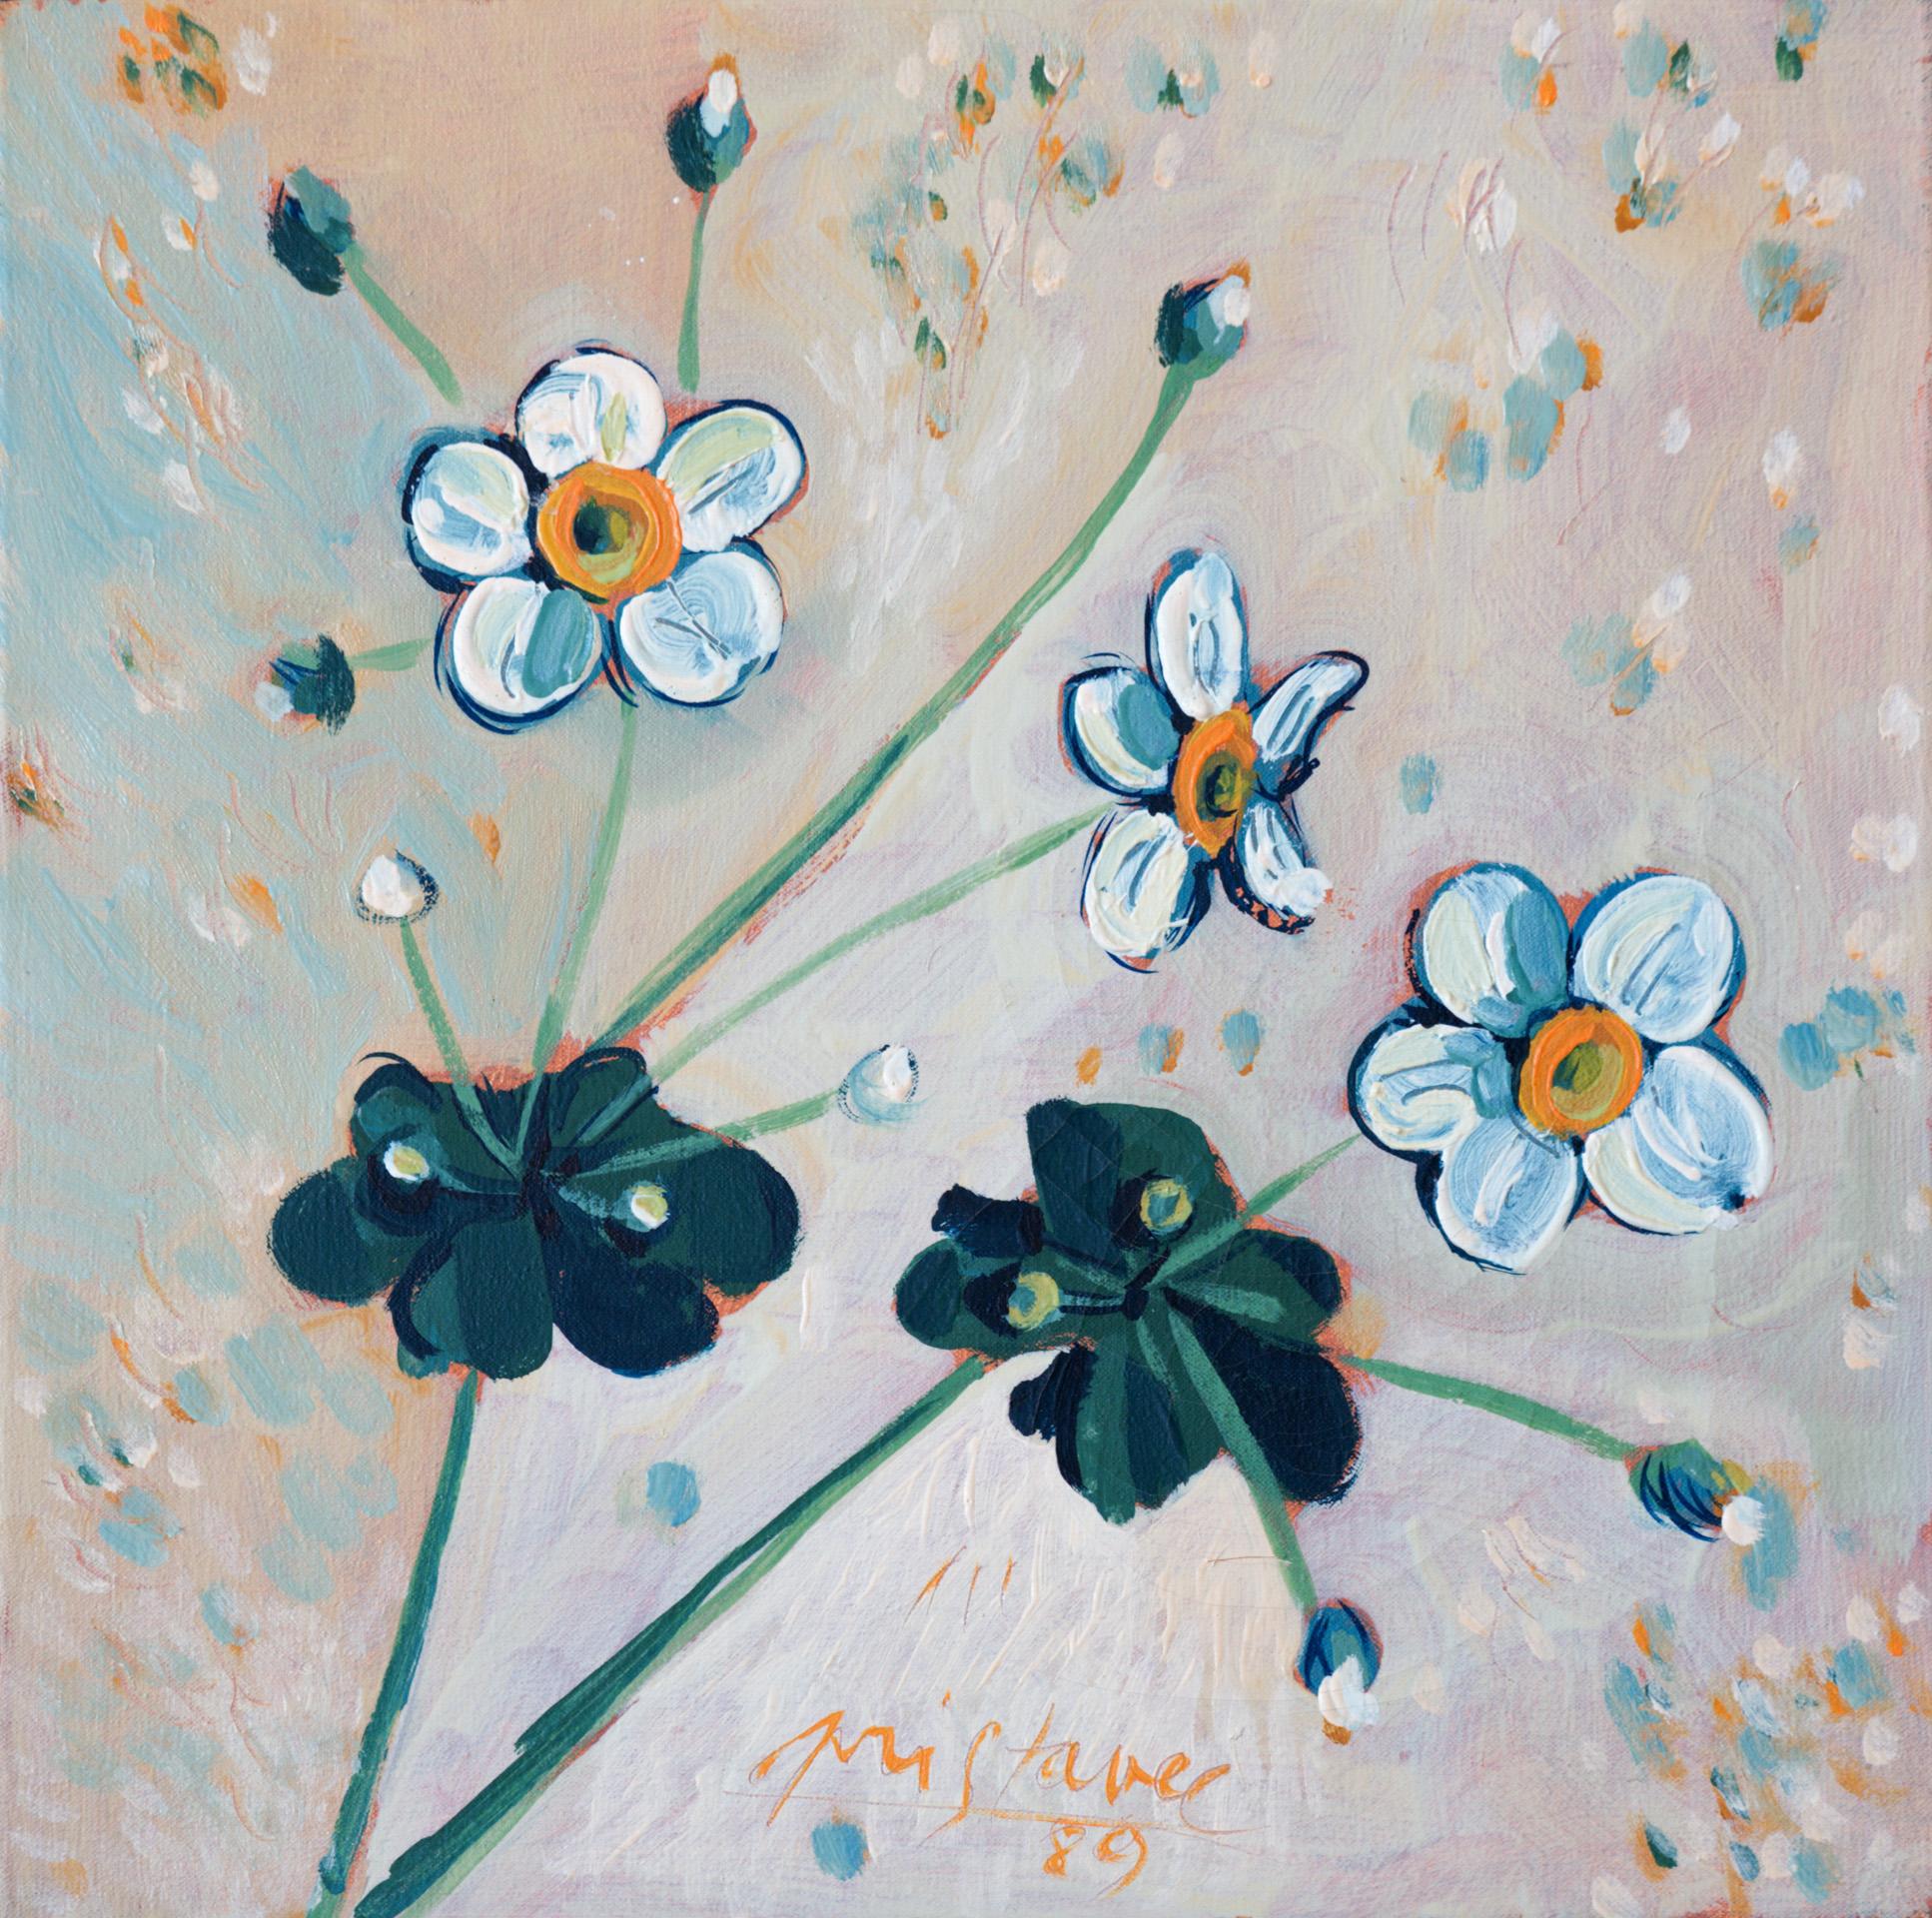 Still Life III / 1989 / oil on canvas / 39x39 cm